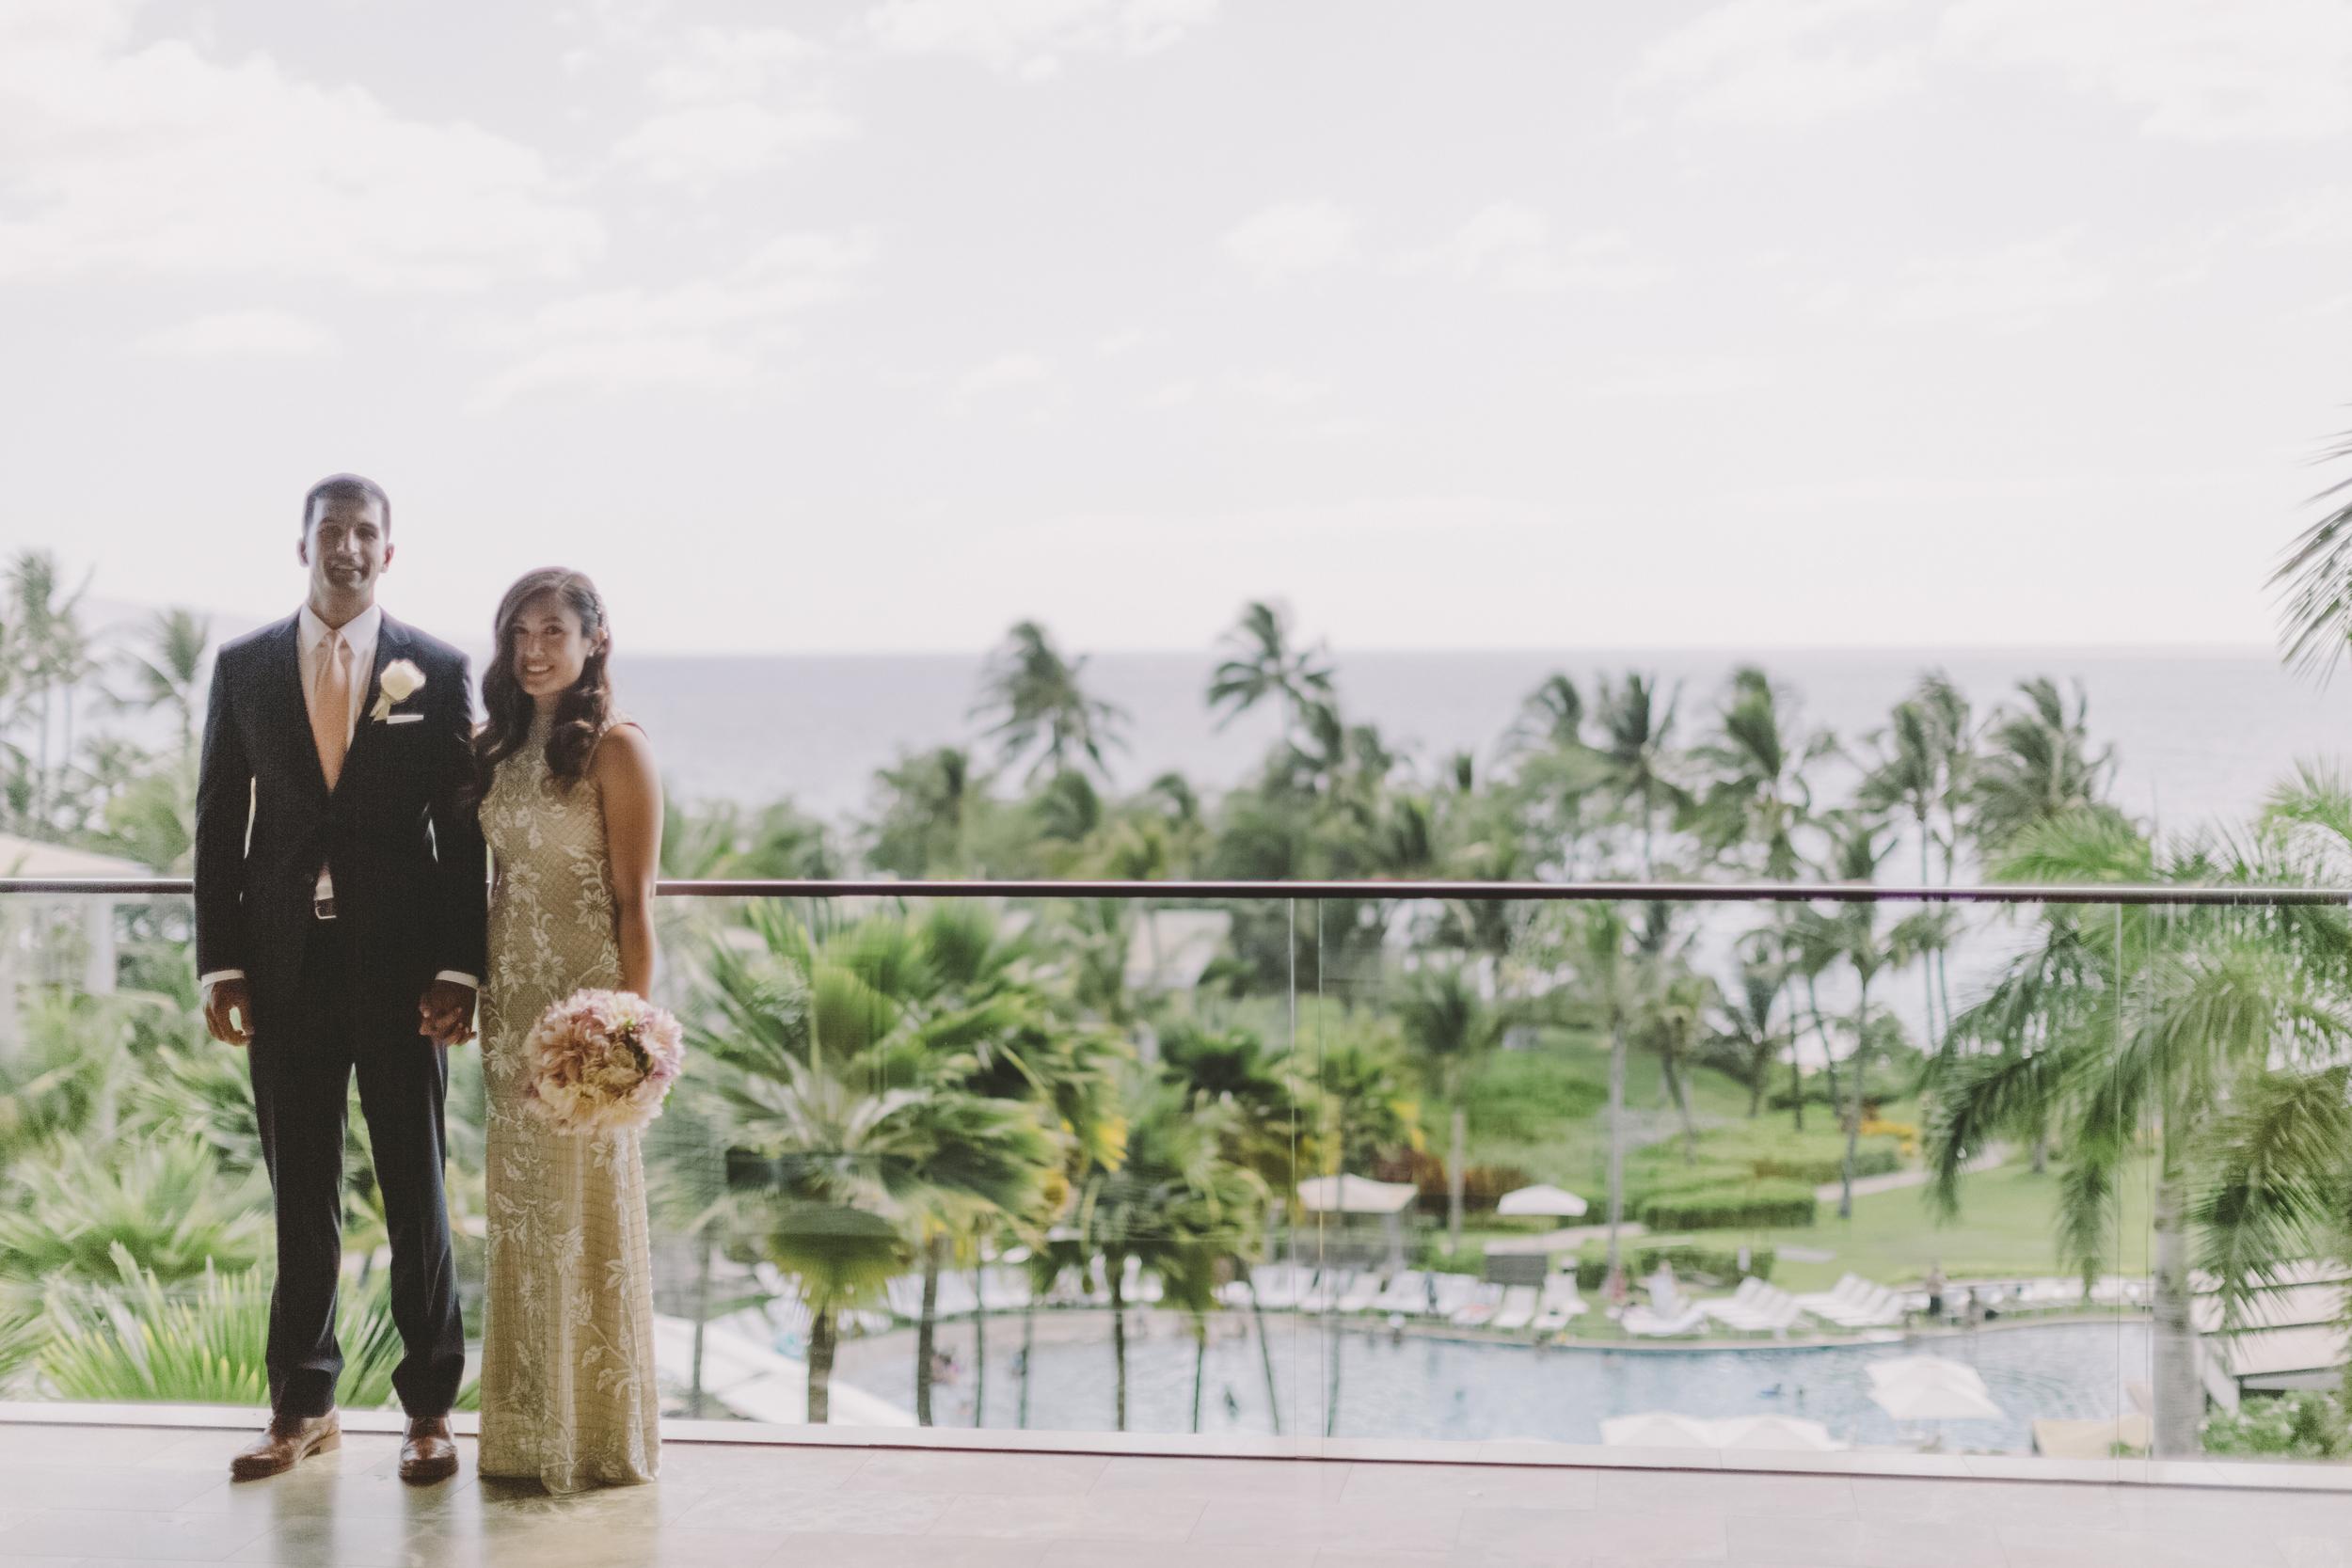 angie-diaz-photography-mokapu-beach-maui-elopement-19.jpg